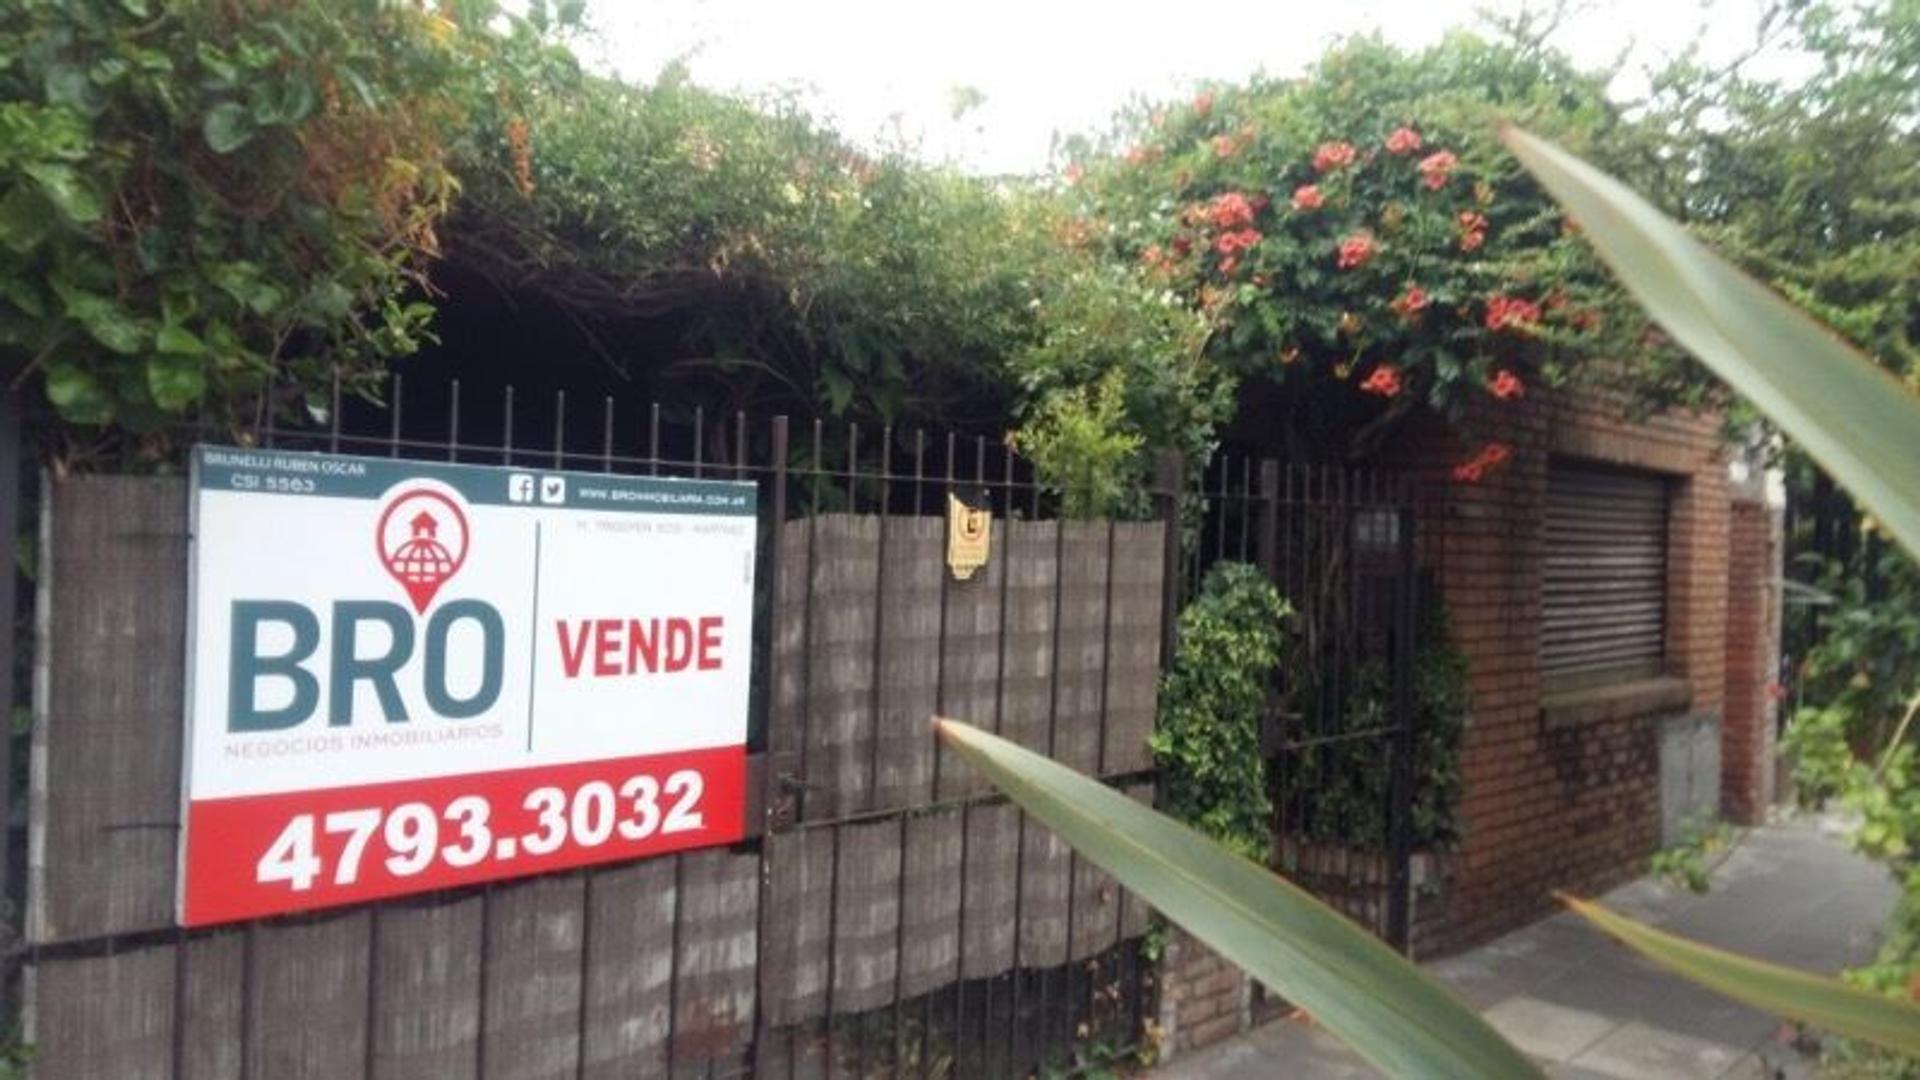 PH AL FRENTE - EXCELENTE UBICACIÓN